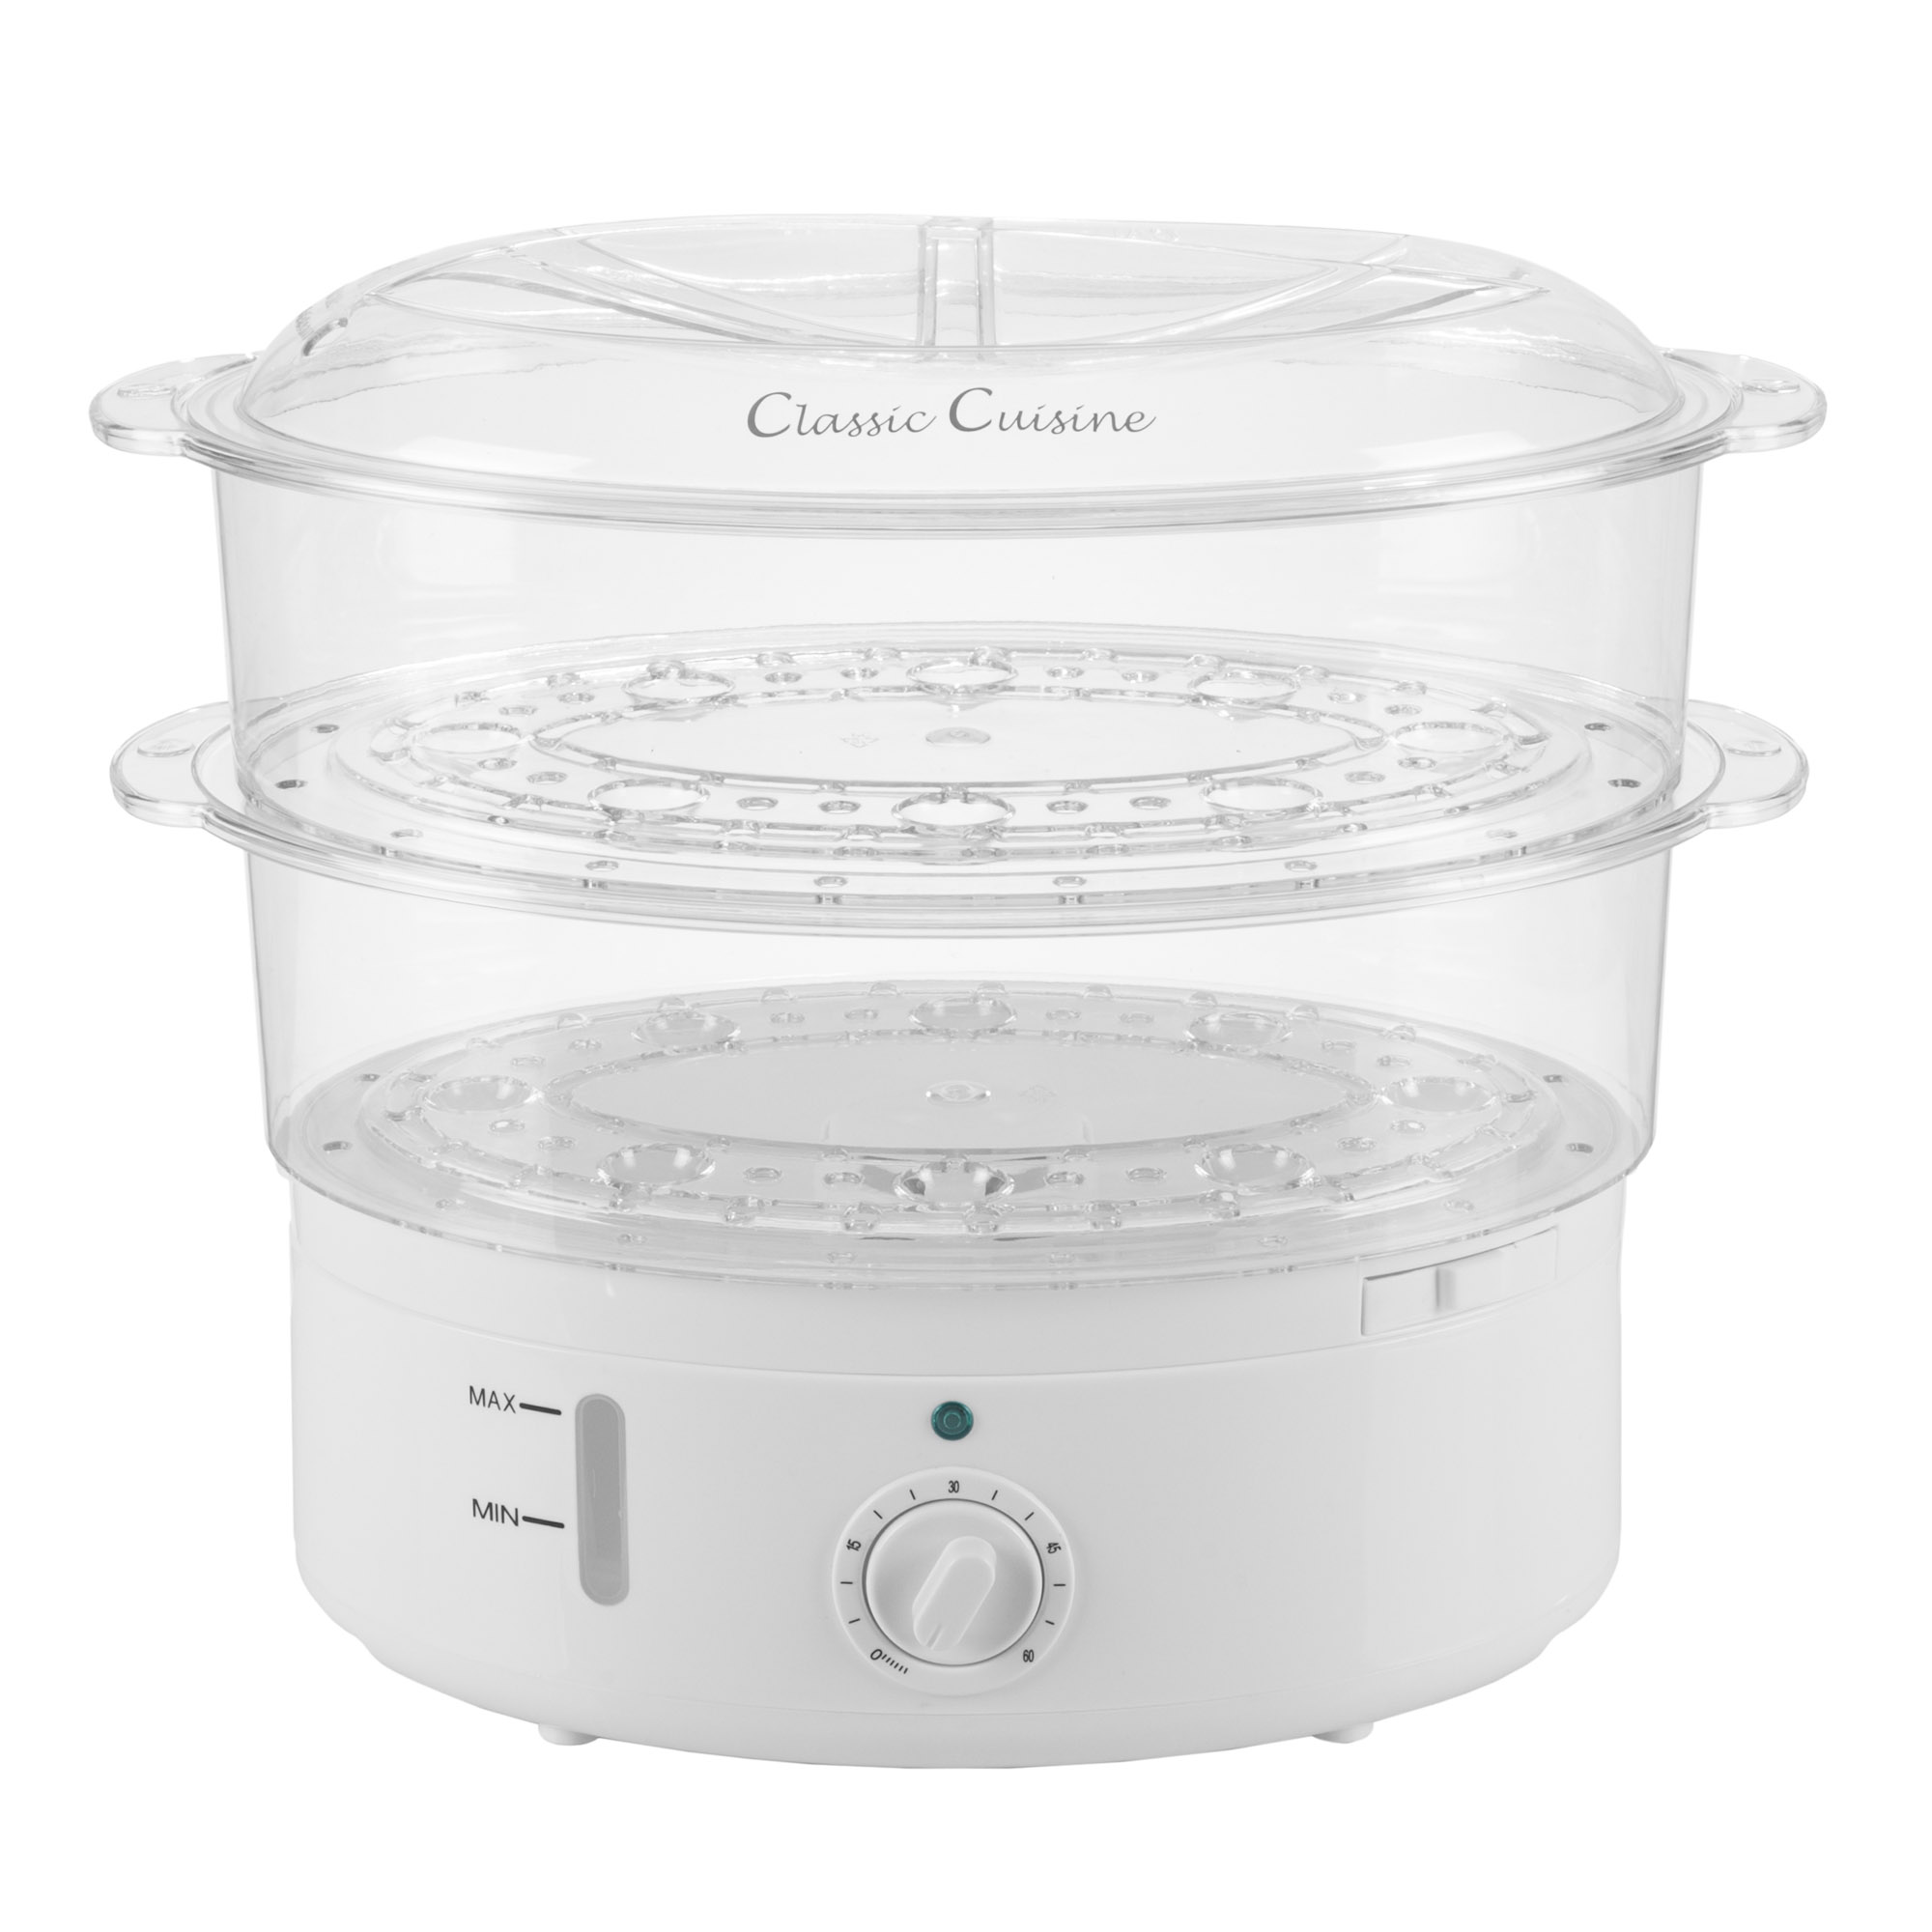 Vegetable Steamer Rice Cooker 63 Quart Electric Steam